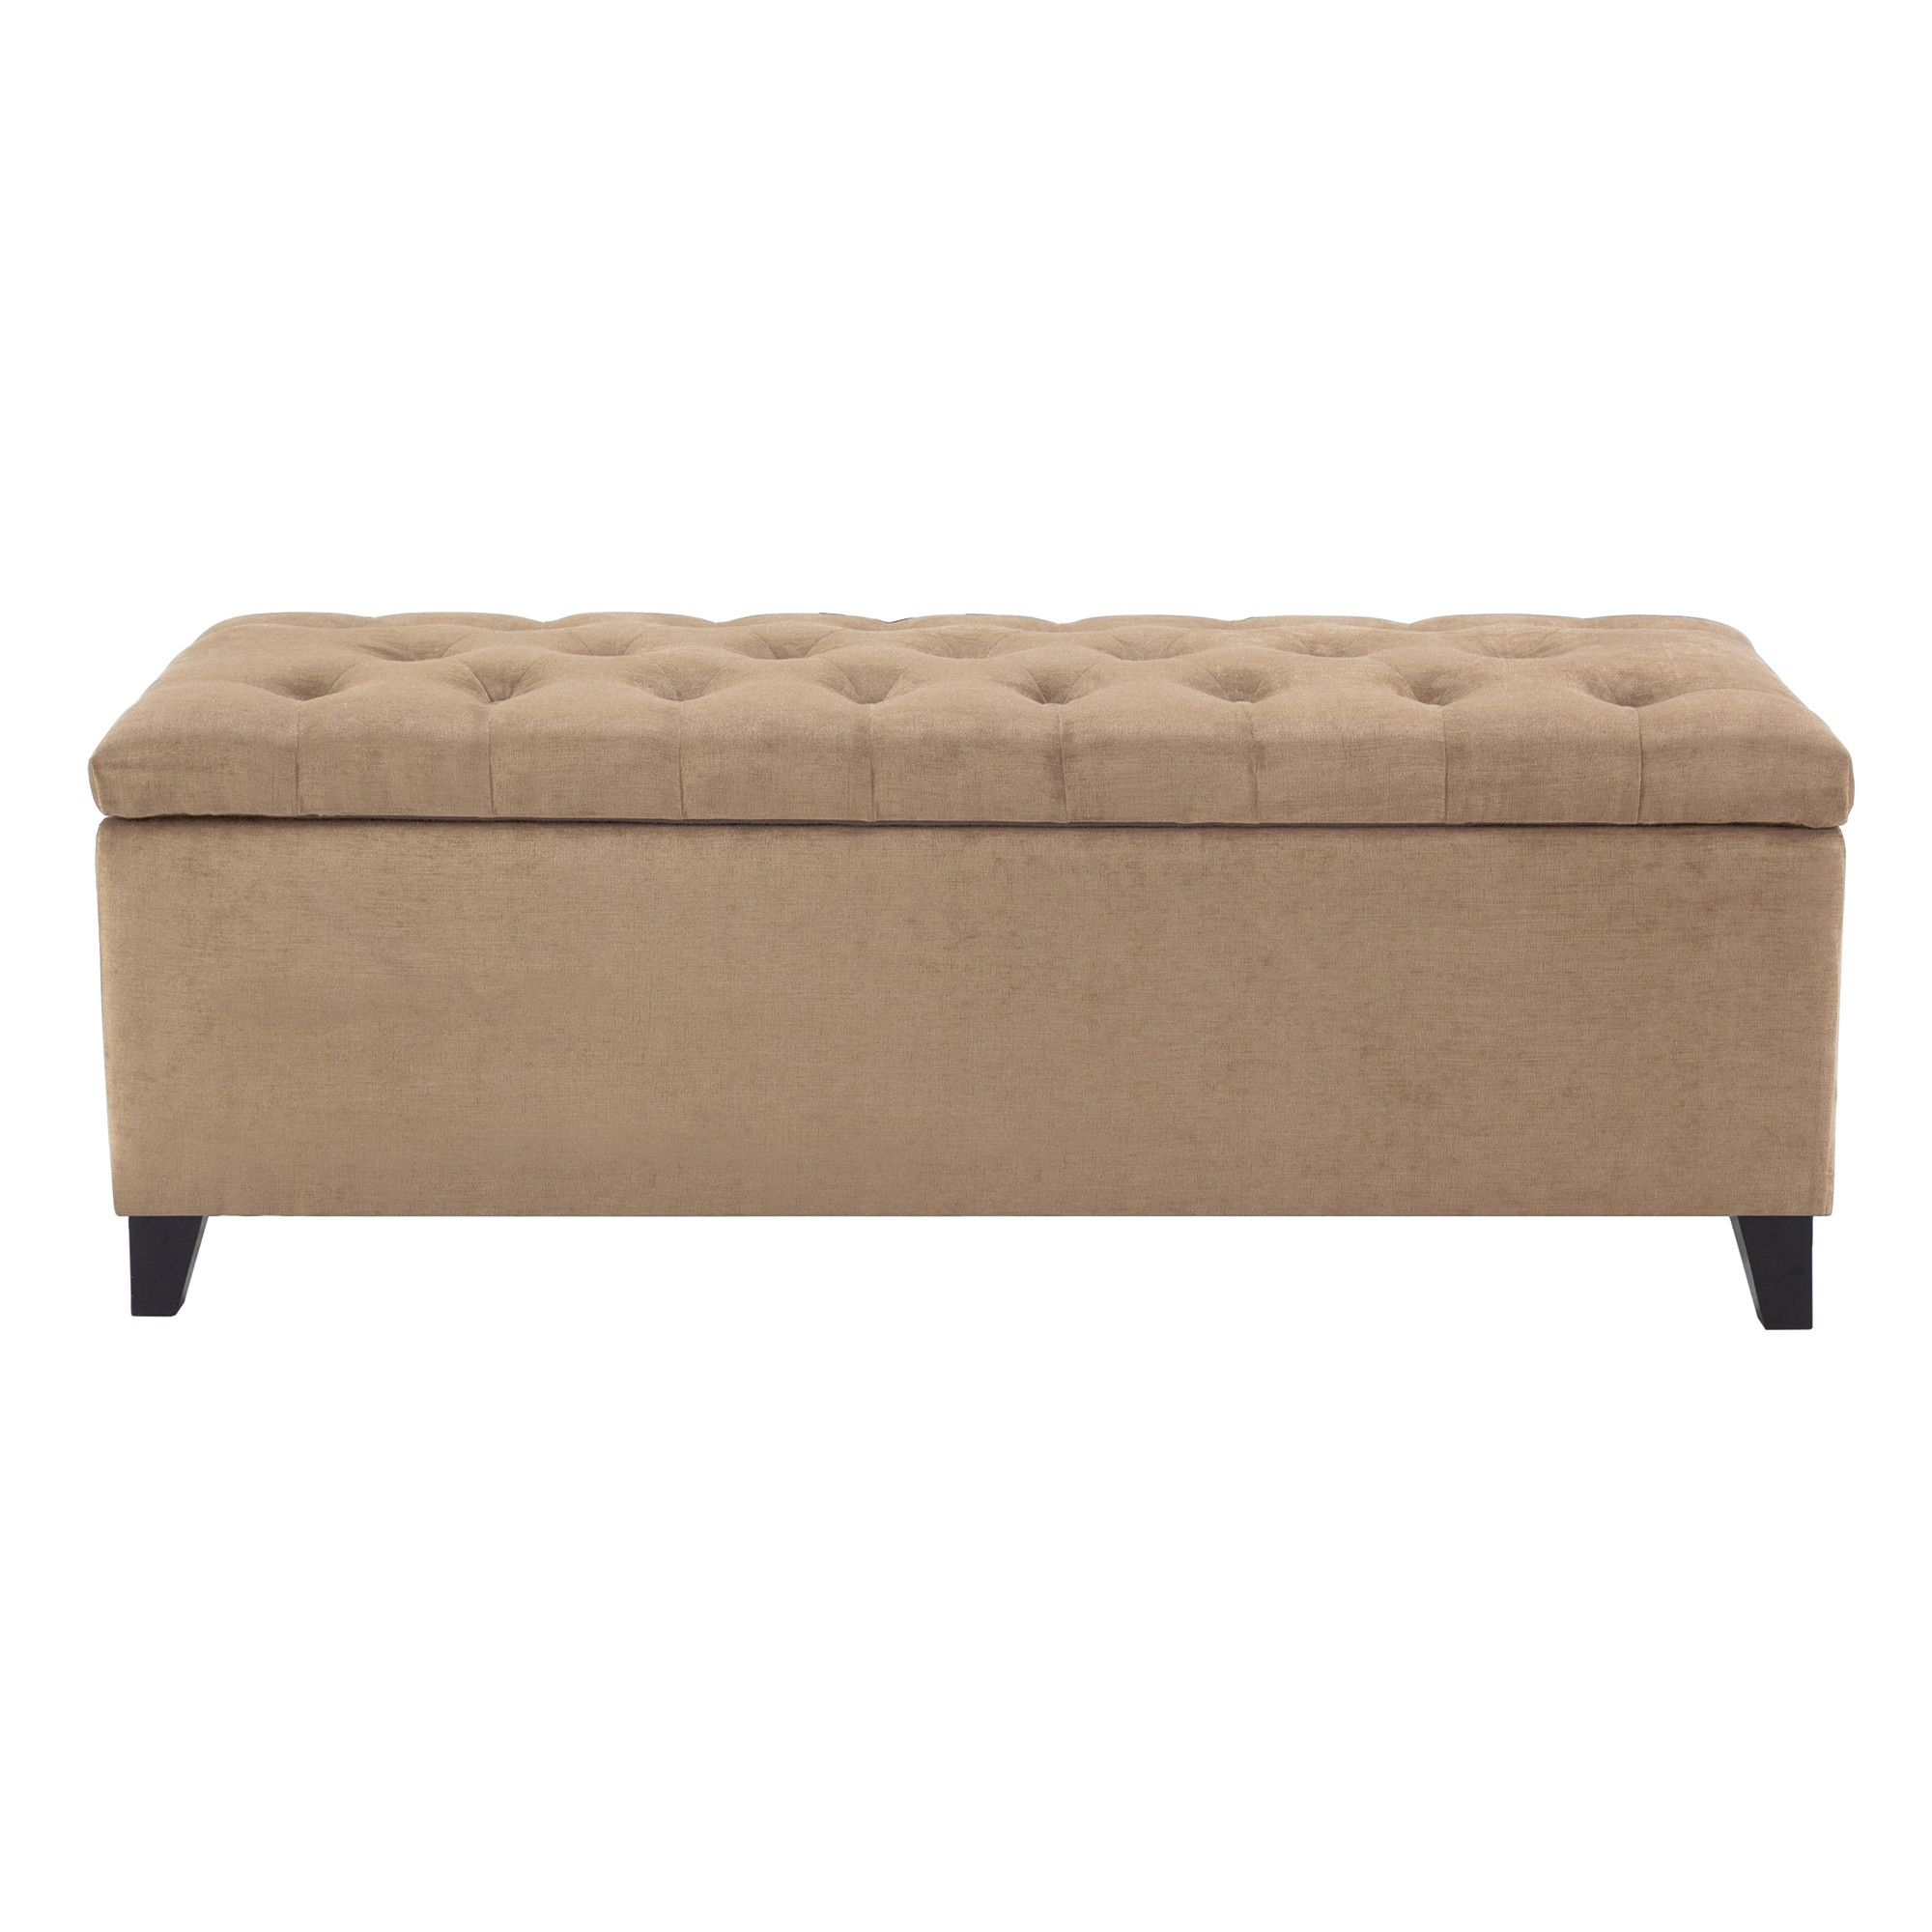 Magnificent Shandra Bench Storage Ottoman With Tufted Top Sand Brown Frankydiablos Diy Chair Ideas Frankydiabloscom